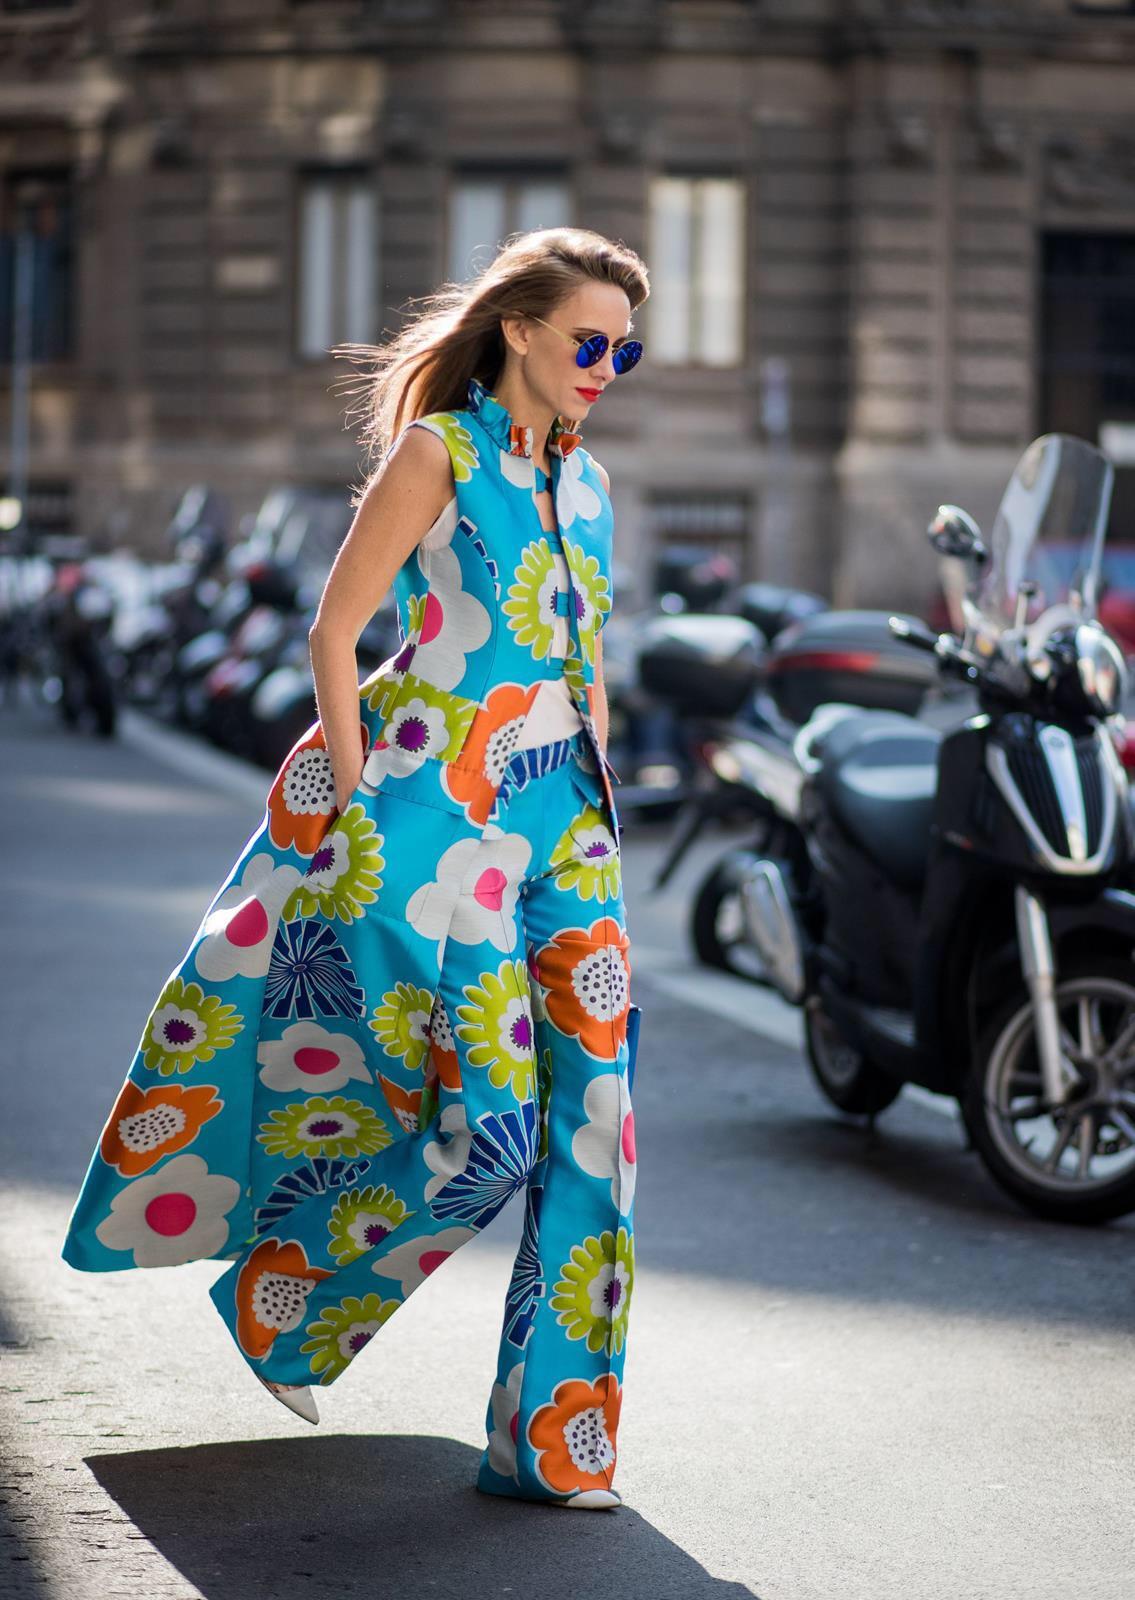 96a9105420 Alexandra Lapp In Seventies Style Wearing Flower Power Silk Jacquard Pants  In Multicolor With A Long. Seventies Style Flower Power Alexandra Lapp